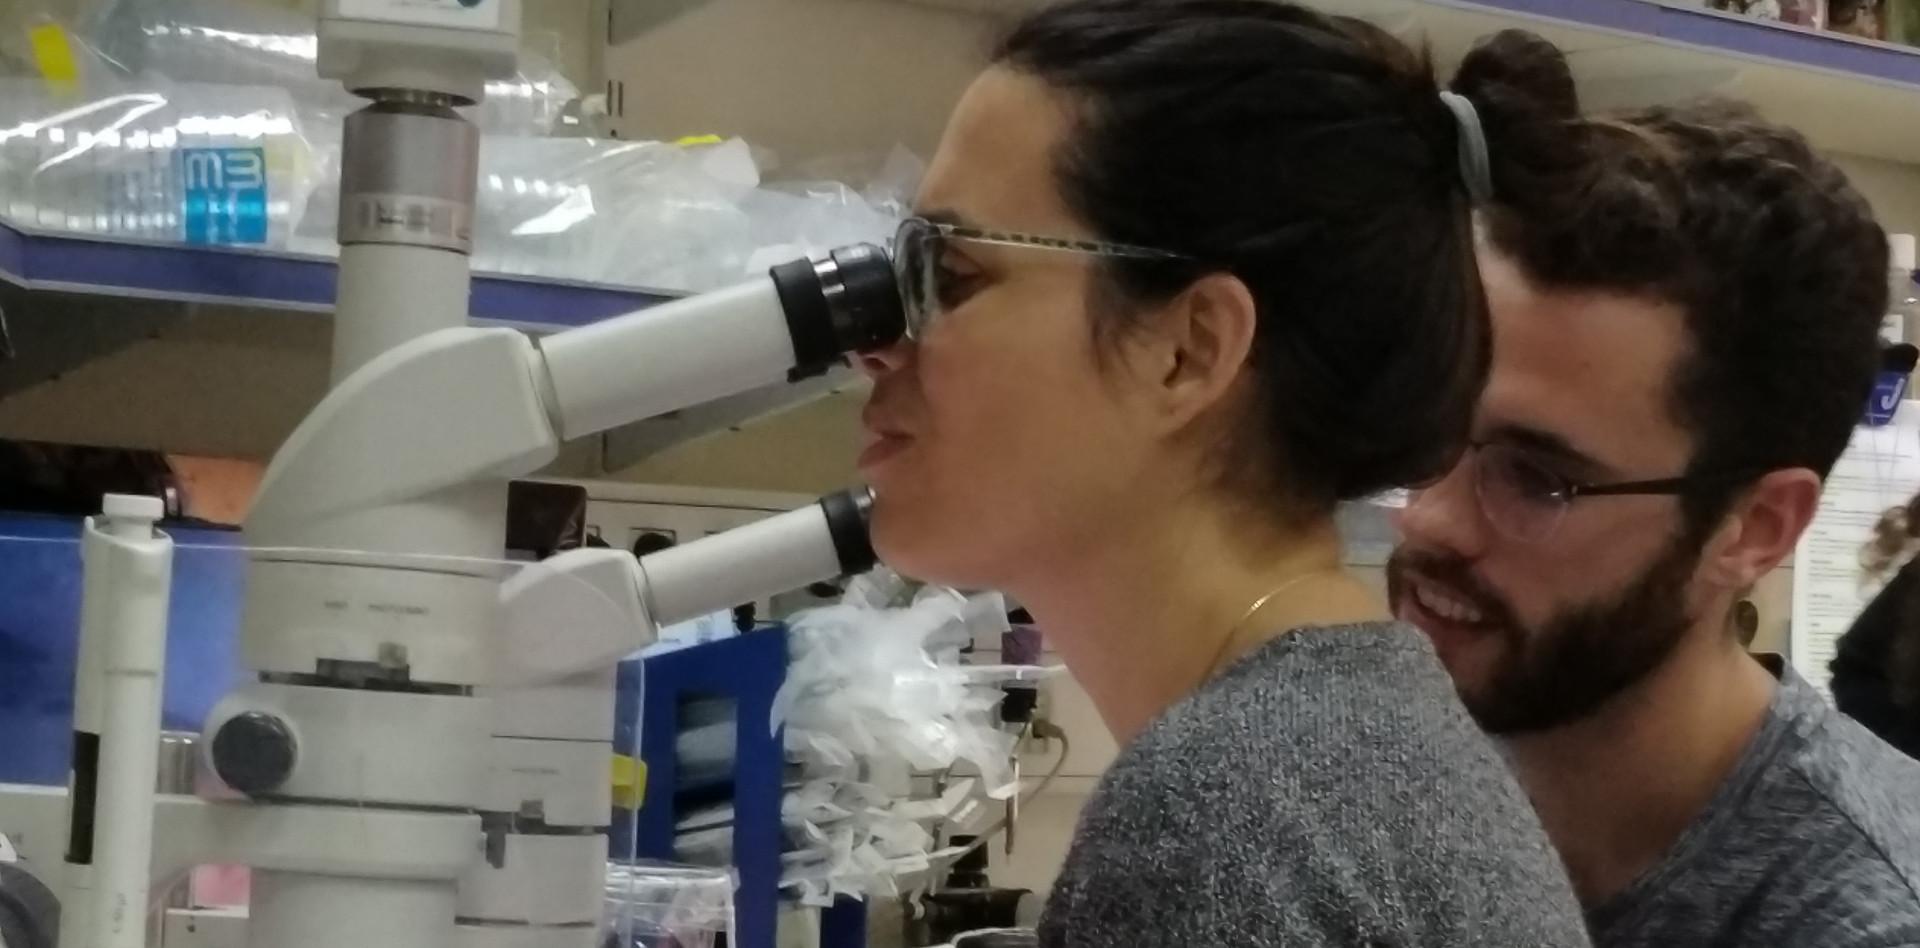 Microscope session